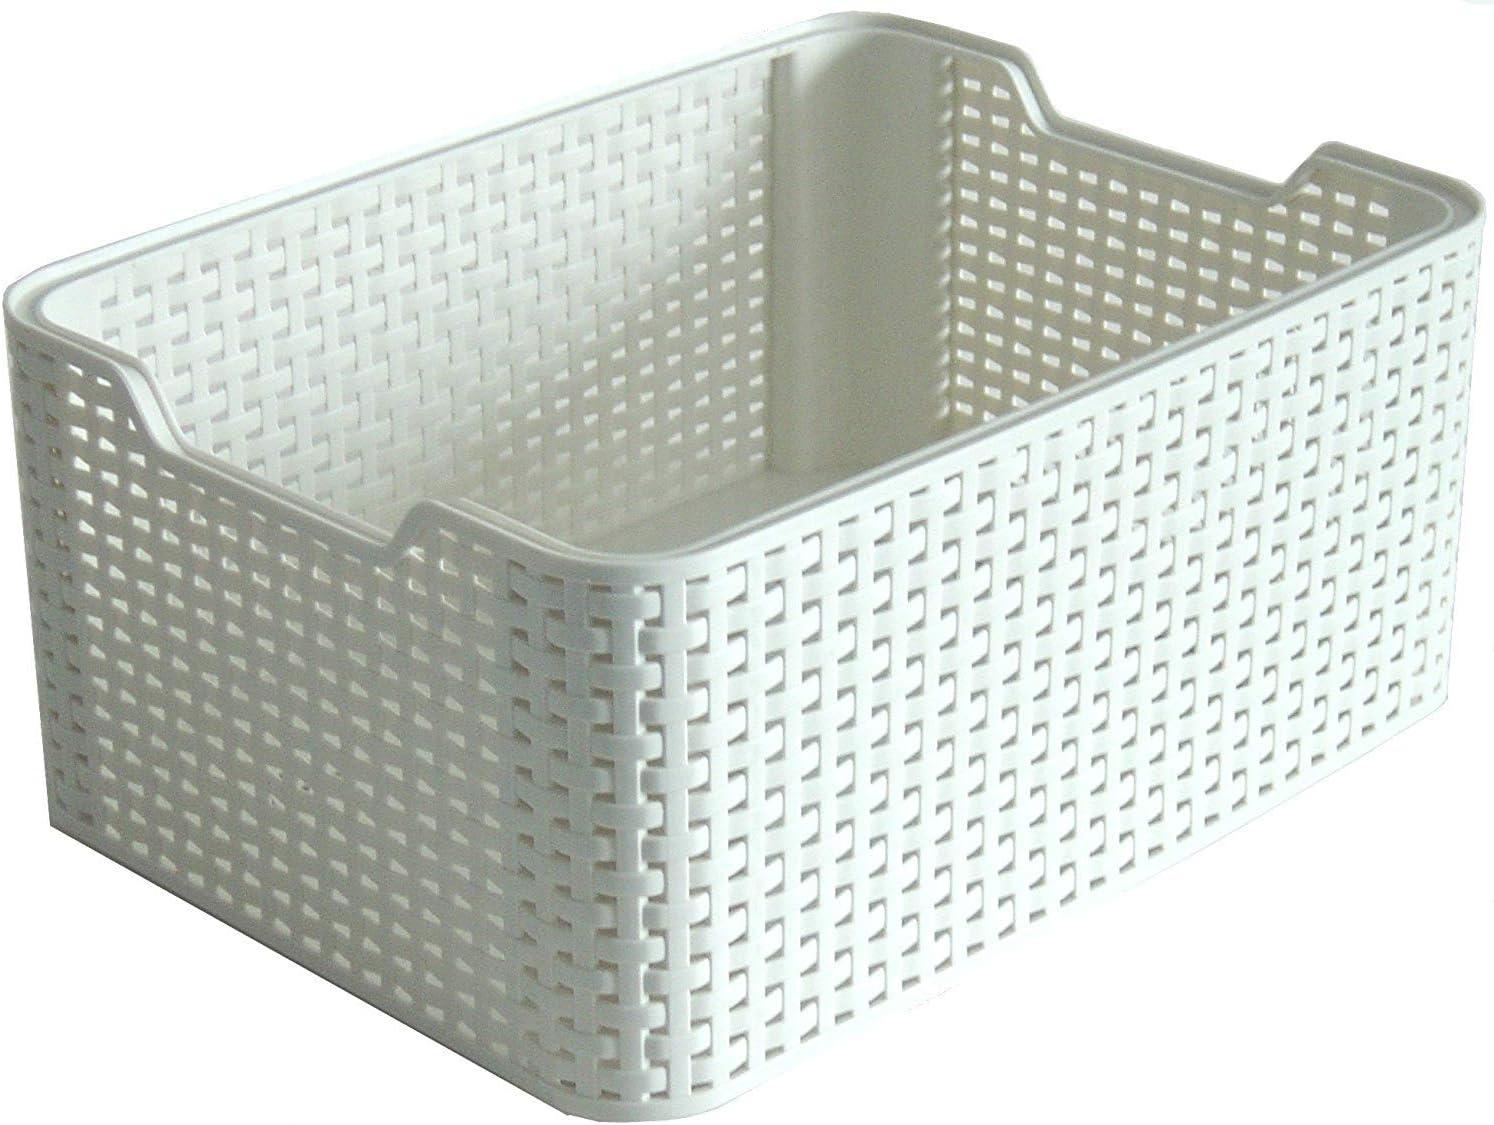 Curver Style Small Rectangular Plastic Storage Basket, Vintage White, 6 Litre